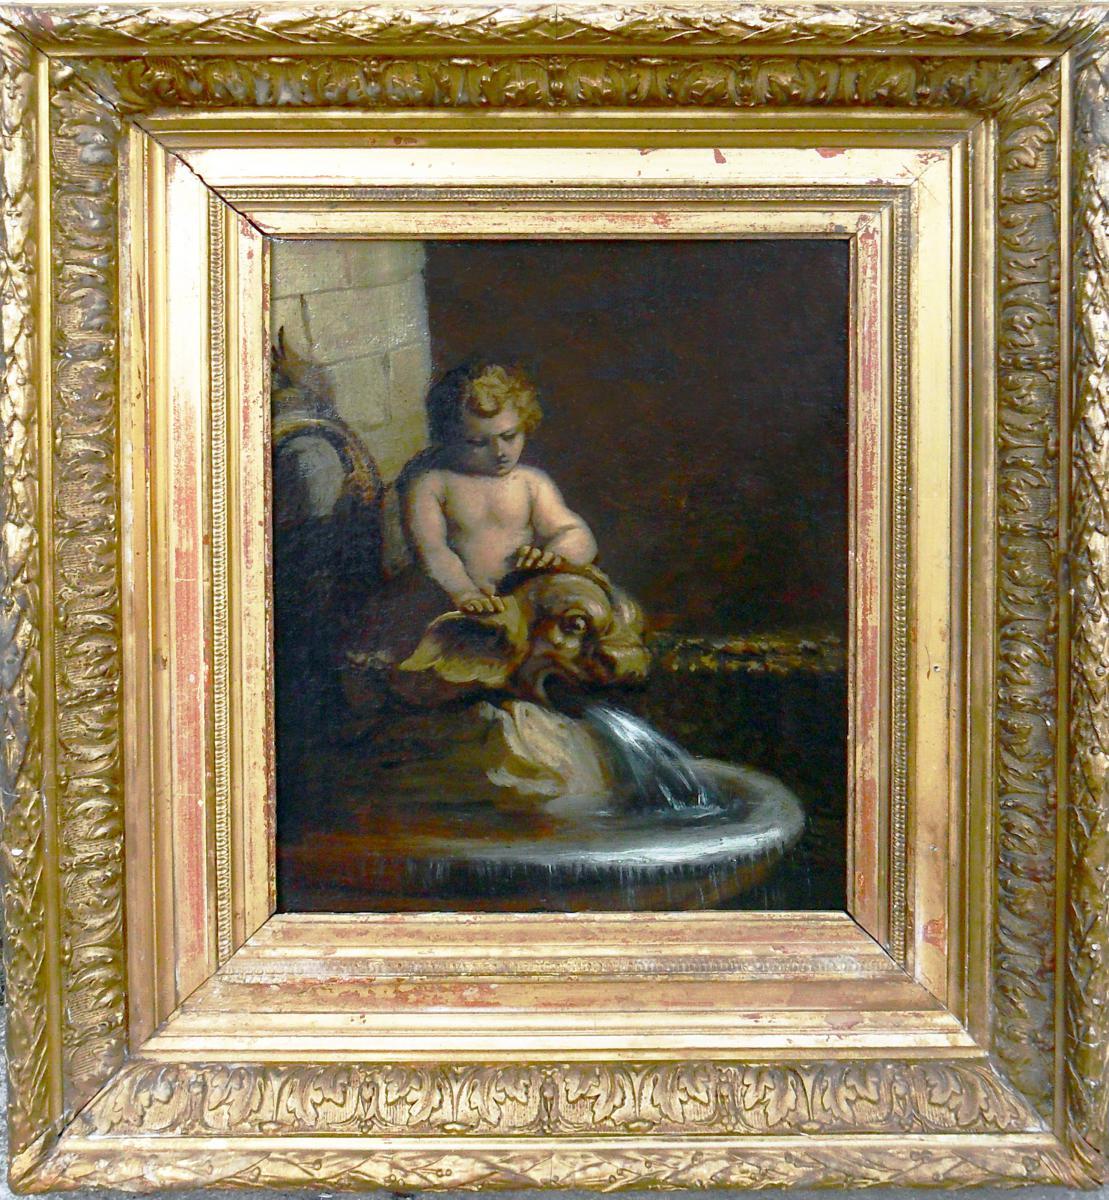 La Fontaine Eighteenth Child